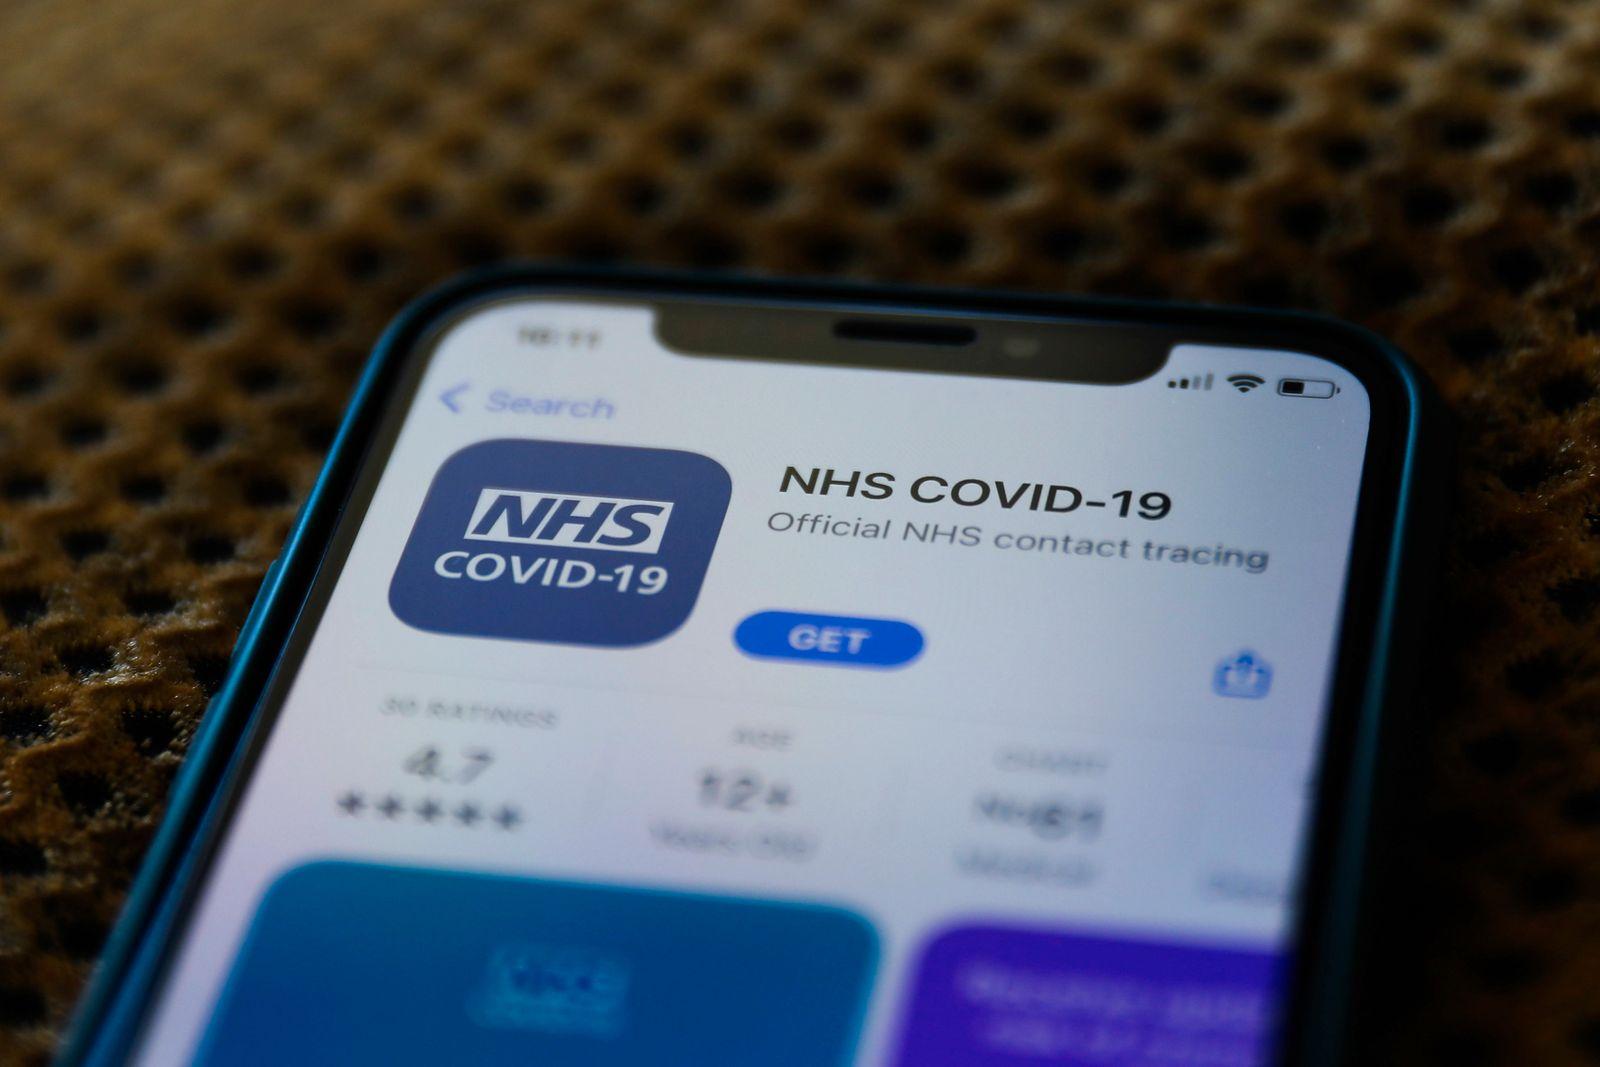 NHS COVID-19 App Photo Illustrations